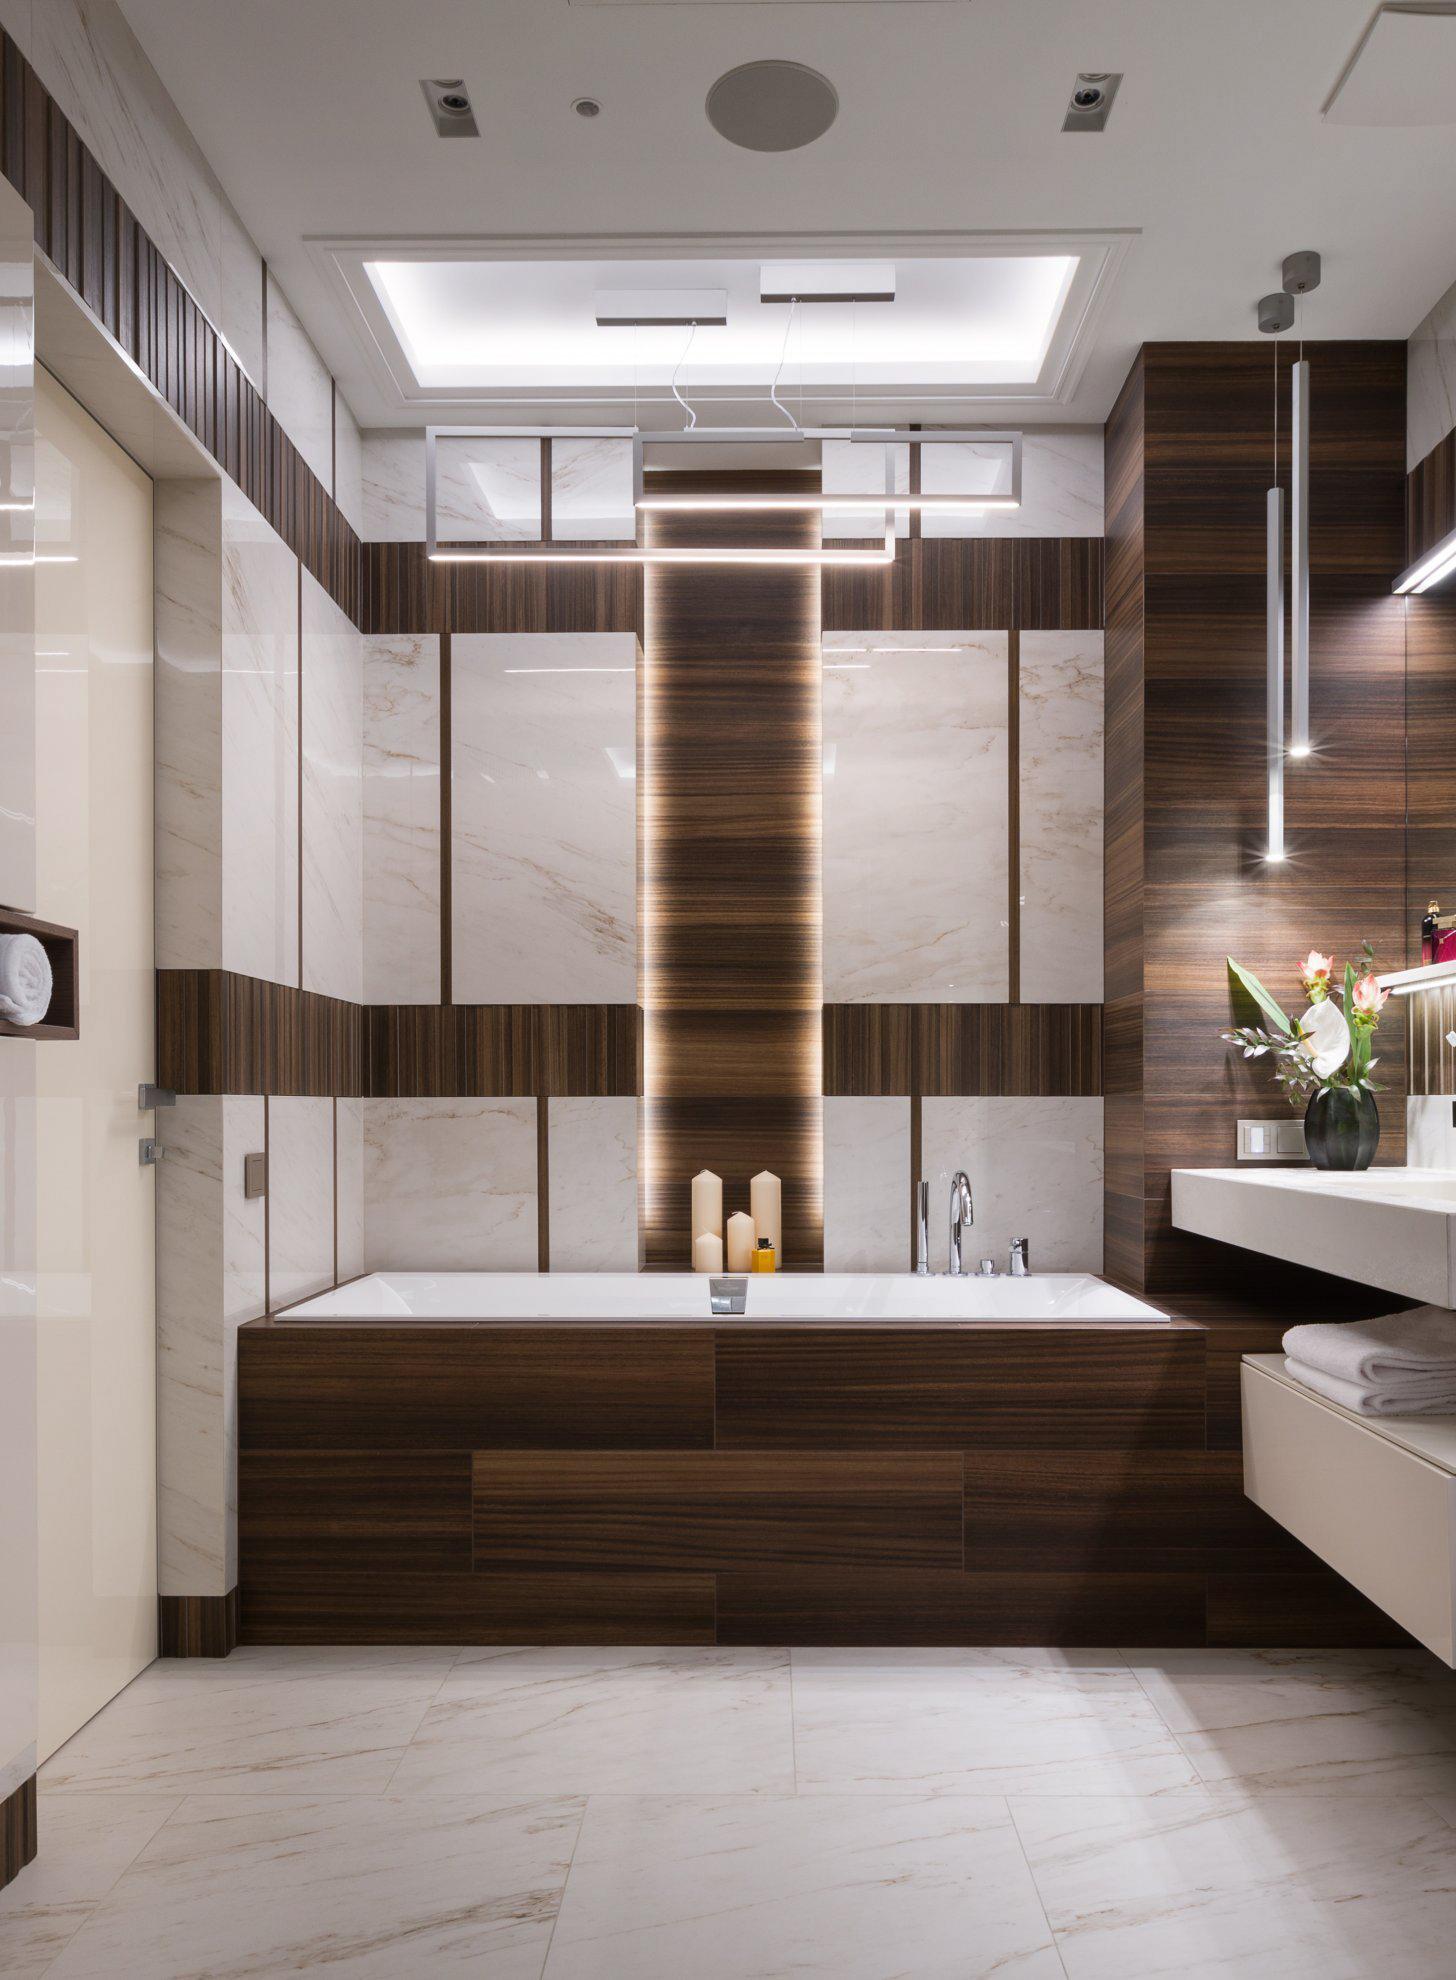 Pecher SKY Apartment Interior Design Kiev, Ukraine – Nataly Bolshakova